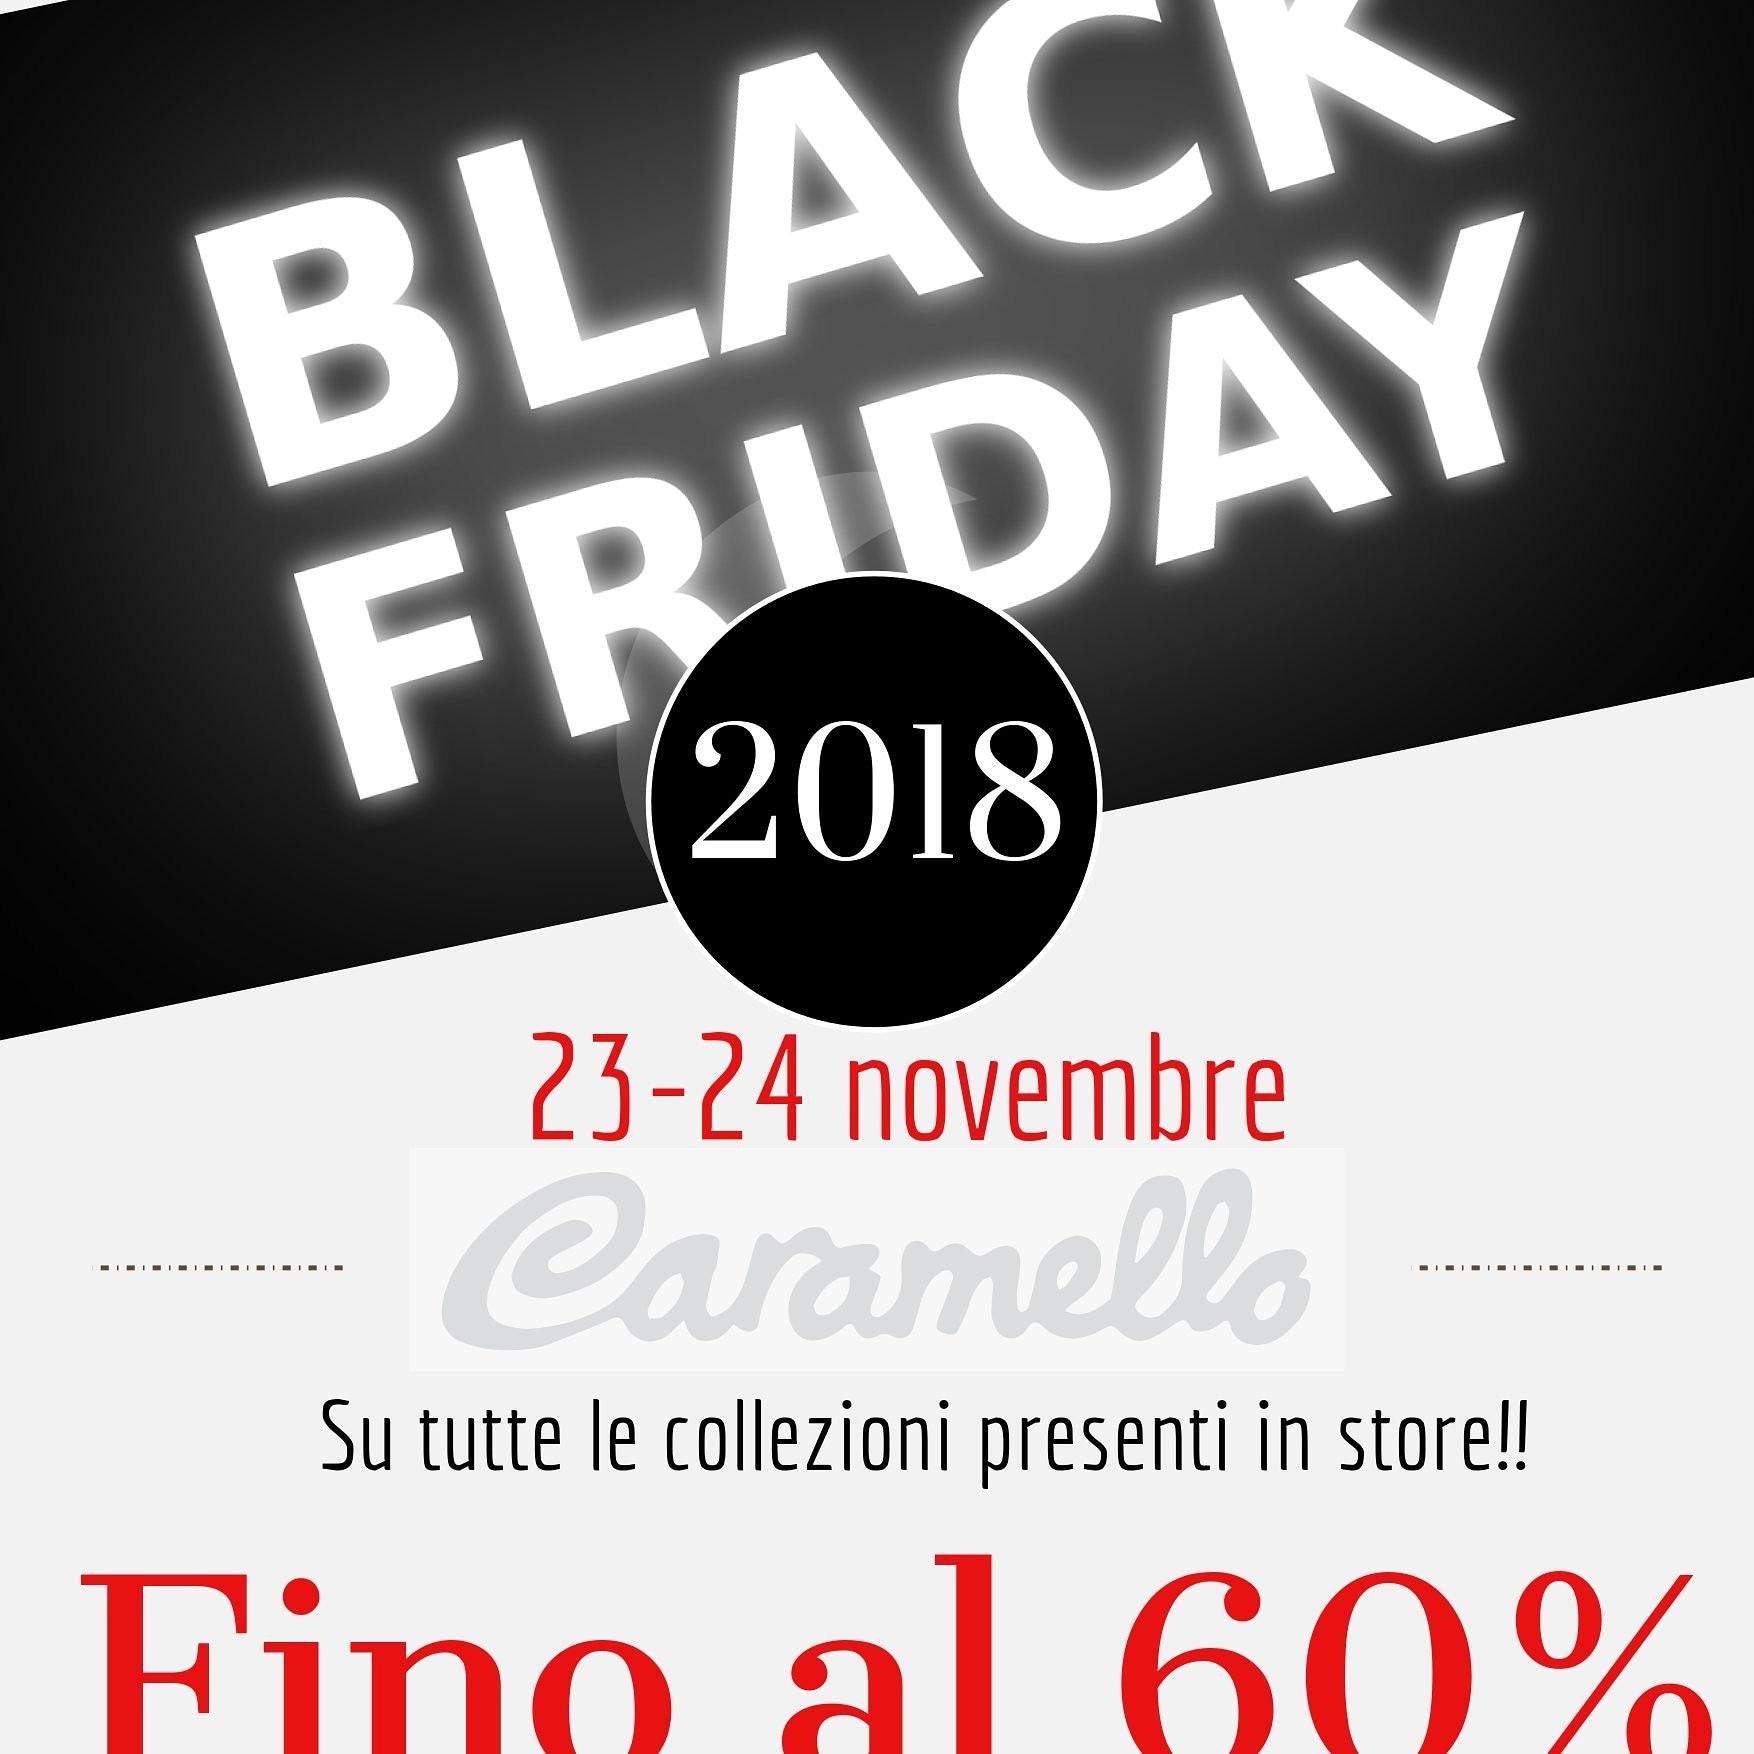 Promo Black Friday 2018